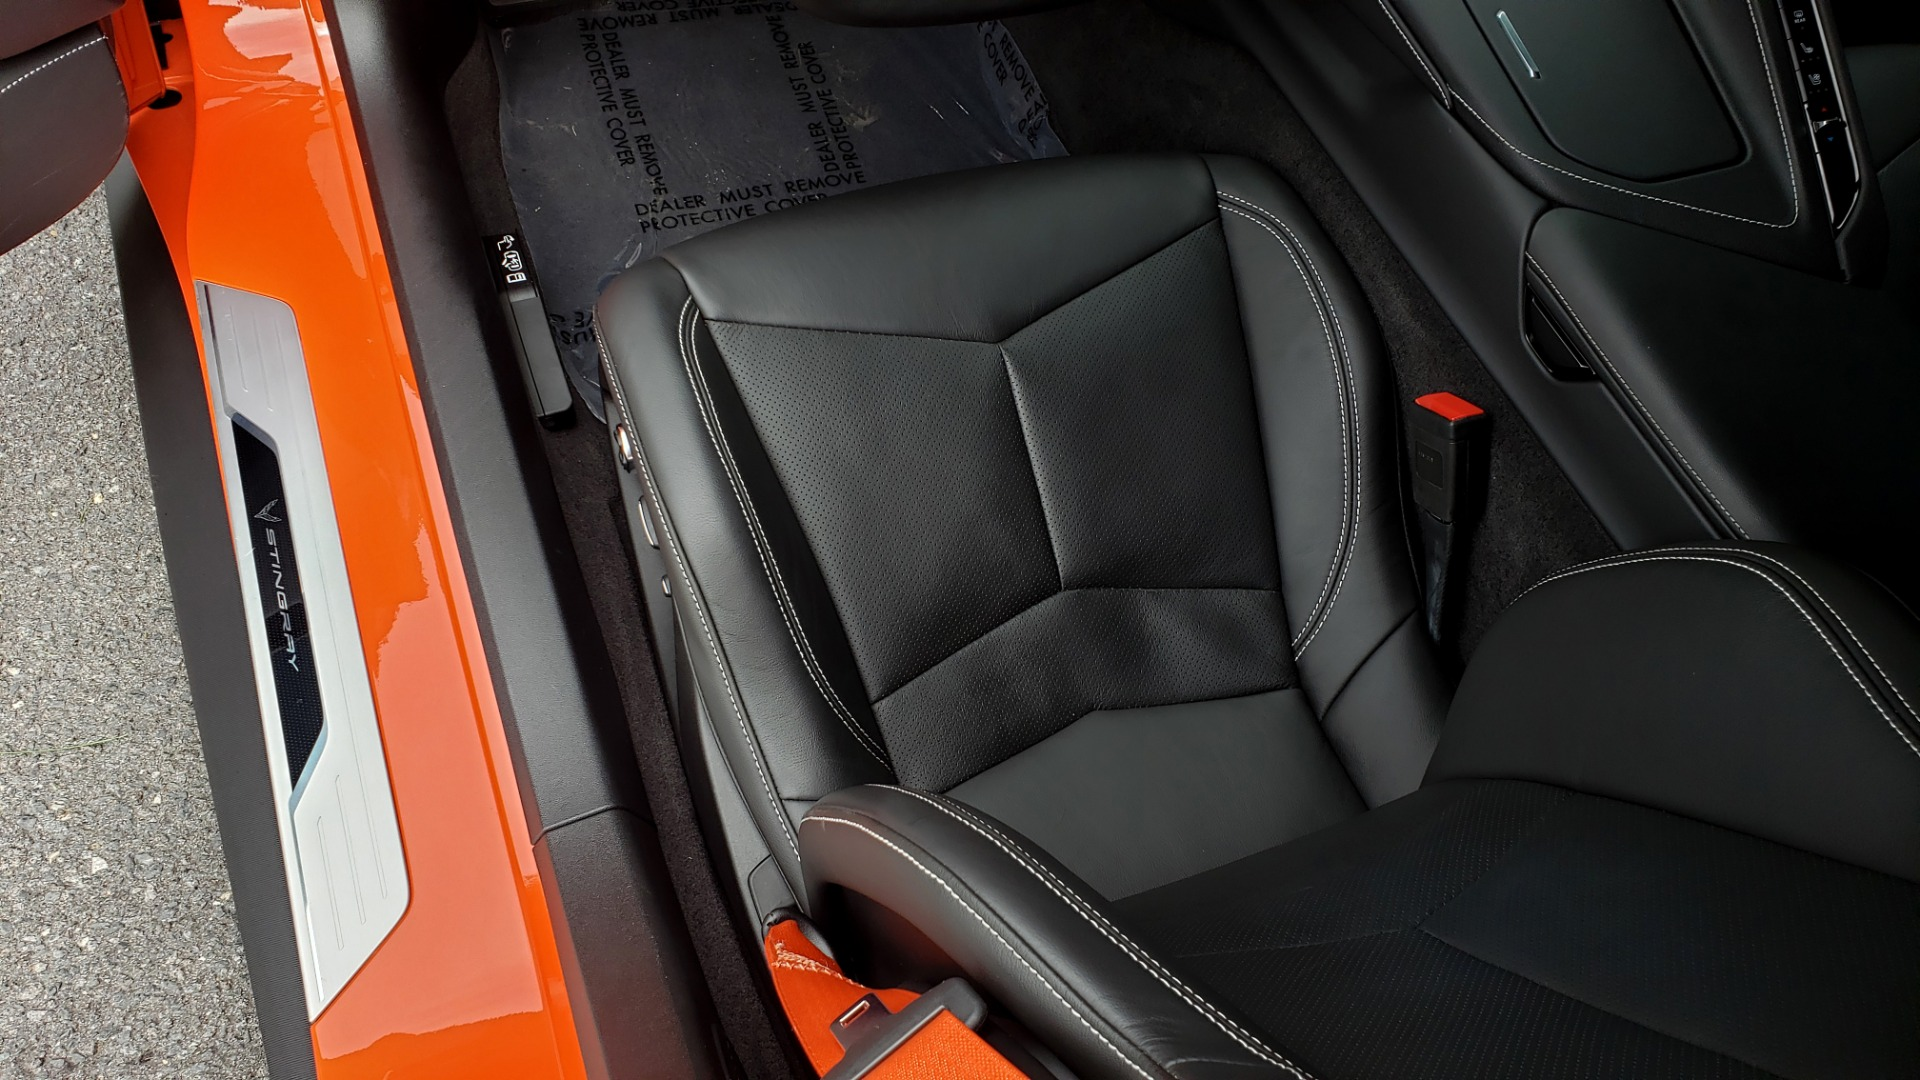 Used 2020 Chevrolet CORVETTE C8 STINGRAY 2LT / 6.2L V8 / 8-SPD AUTO / NAV / BOSE / REARVIEW / DATA RECOR for sale Sold at Formula Imports in Charlotte NC 28227 37